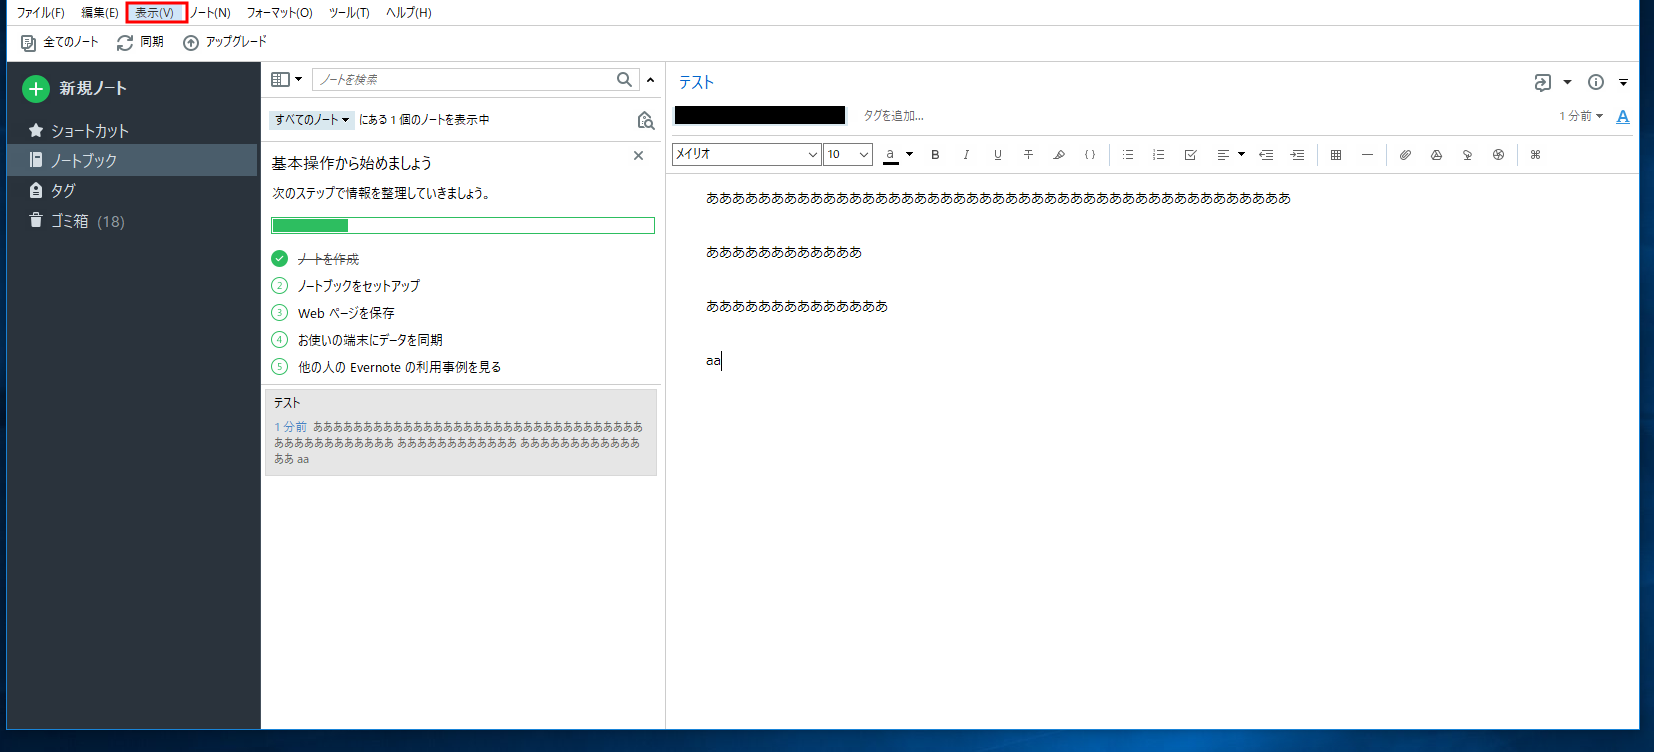 EvernoteのWindows版で文字数を見る